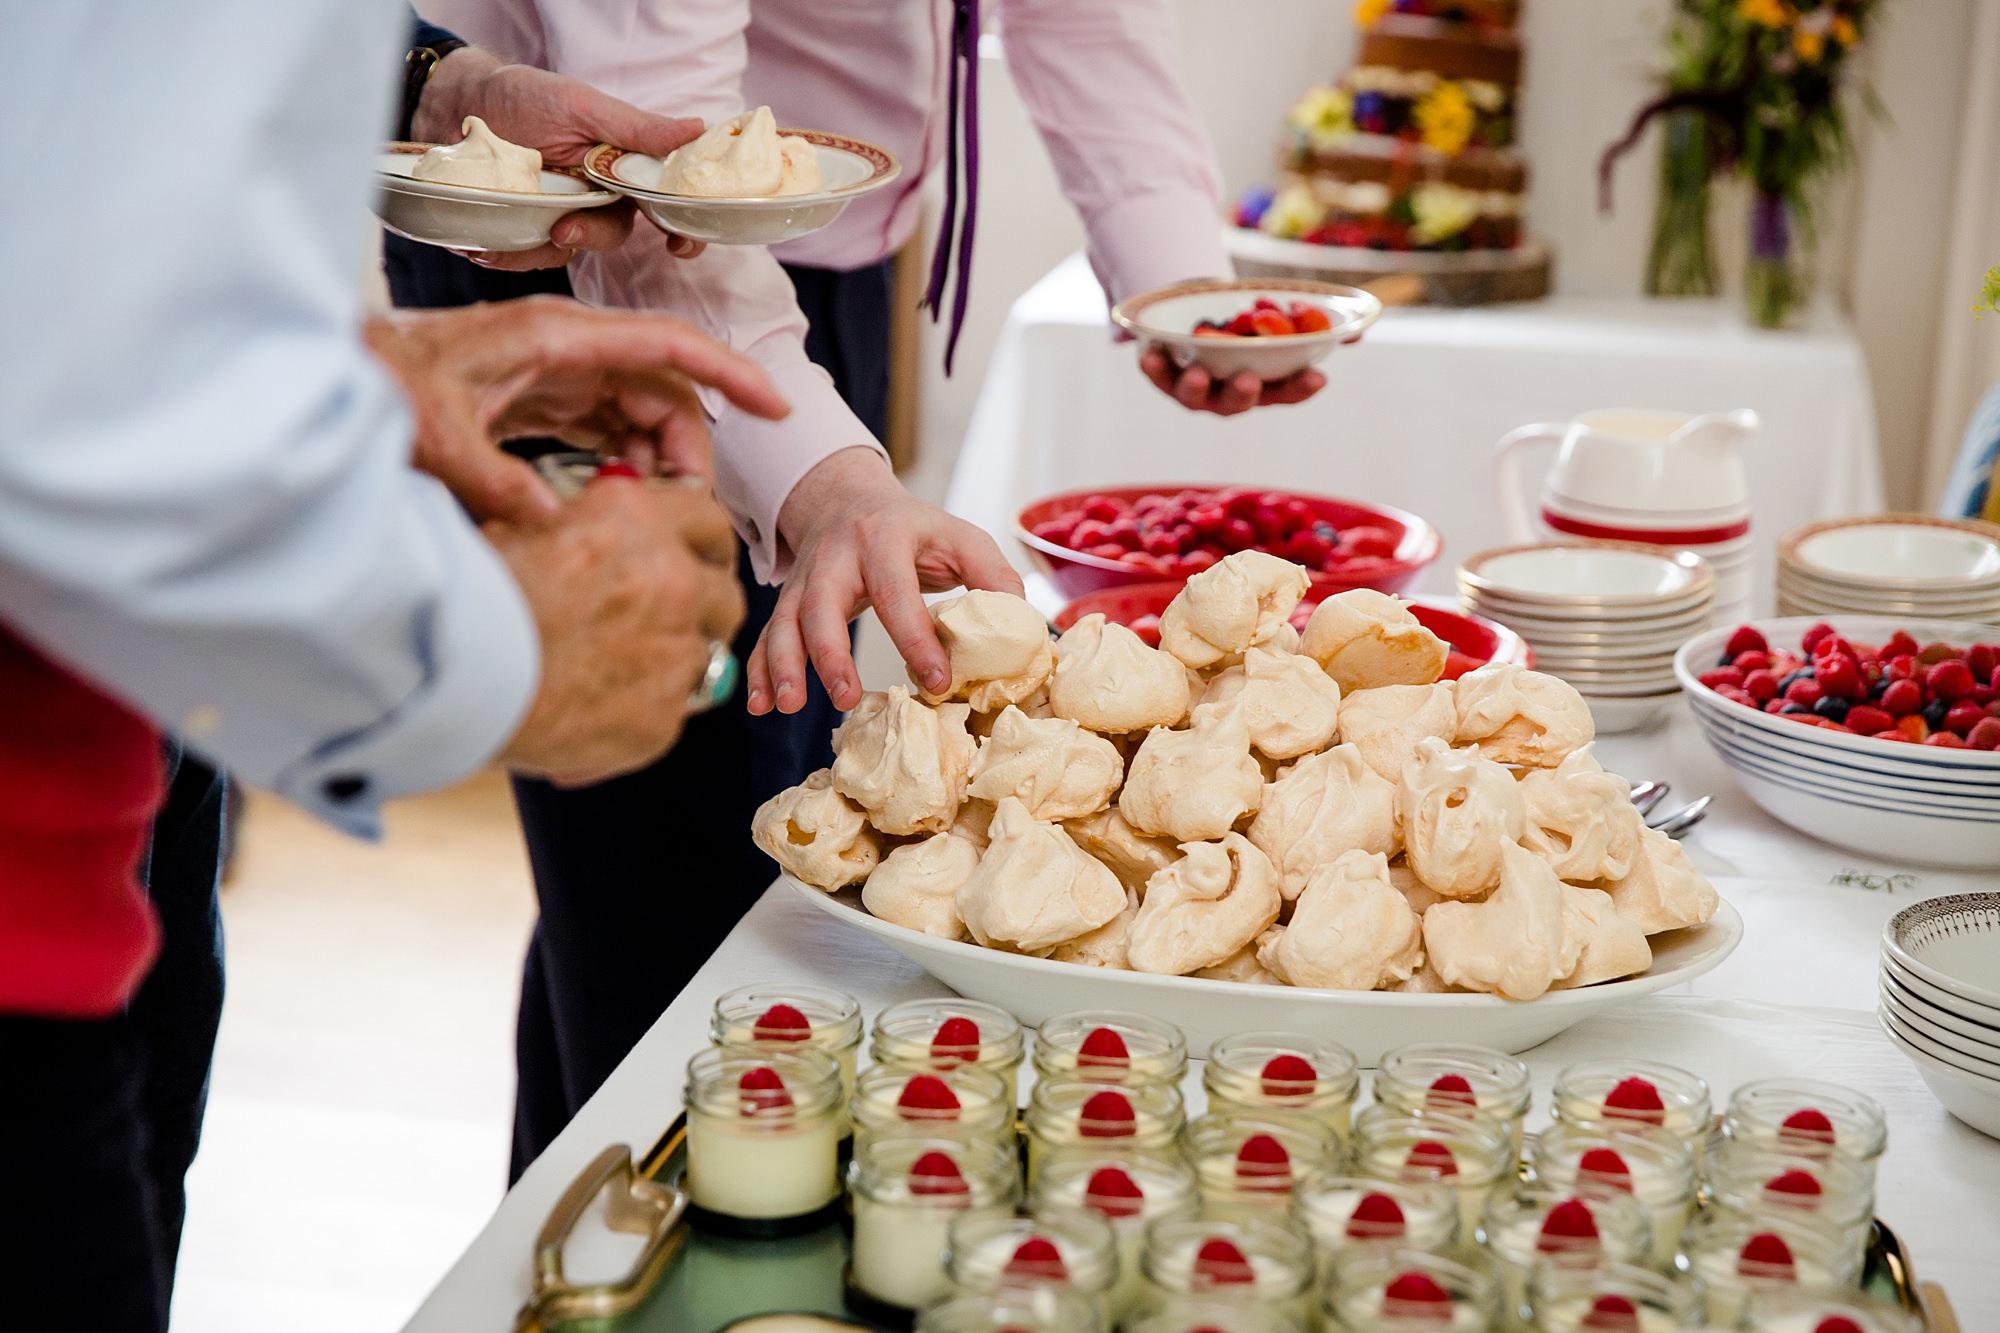 Fun village hall wedding guests help themselves to dessert